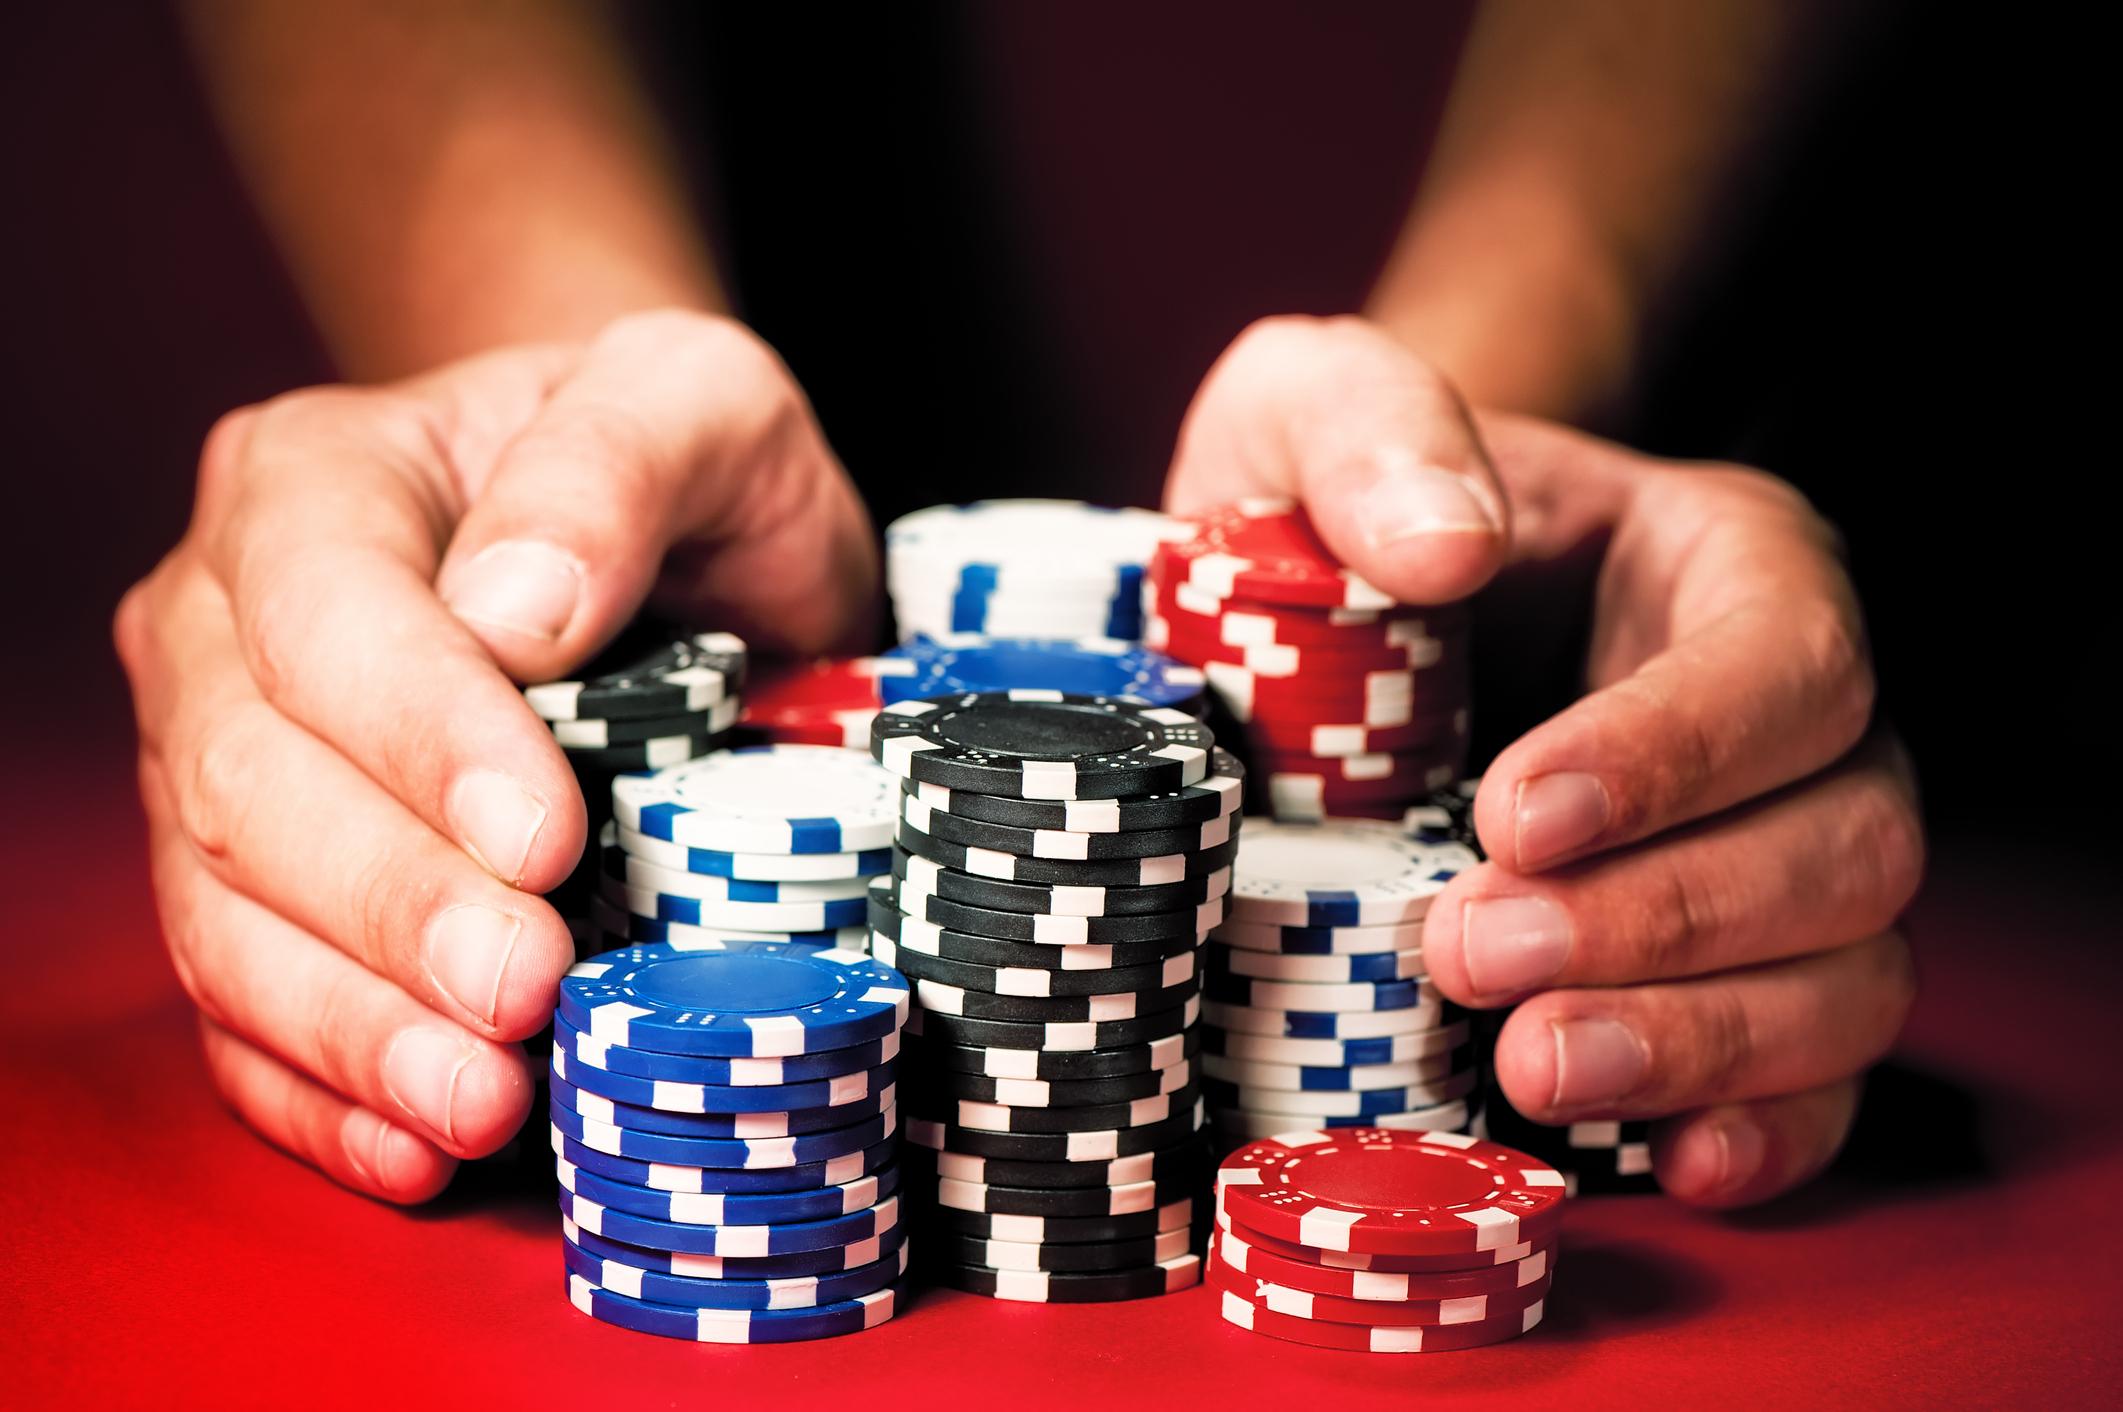 Hands pushing stacks of casino chips.